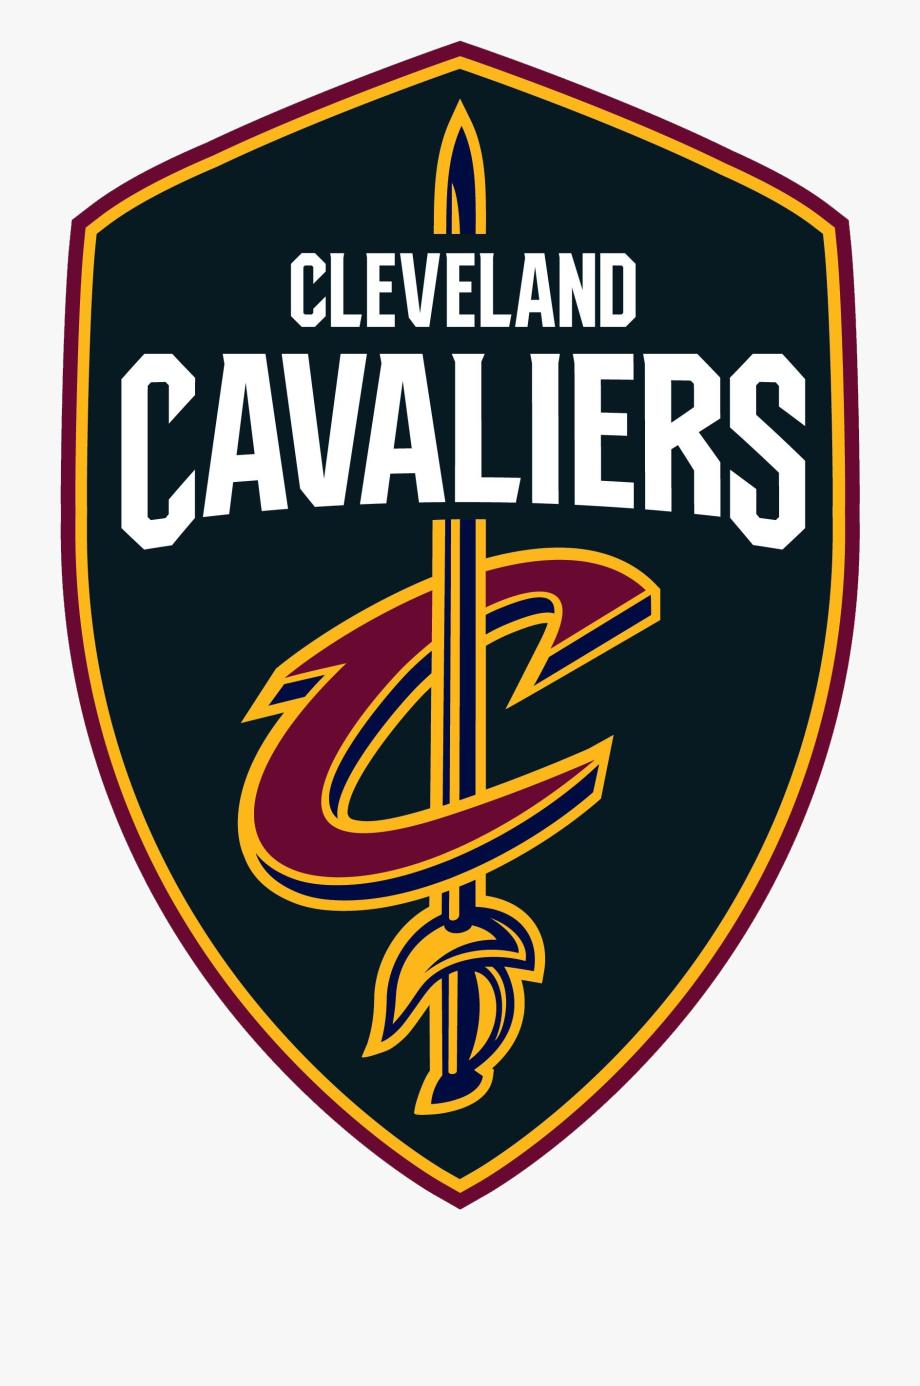 Cleveland Cavaliers Logo Cavs.